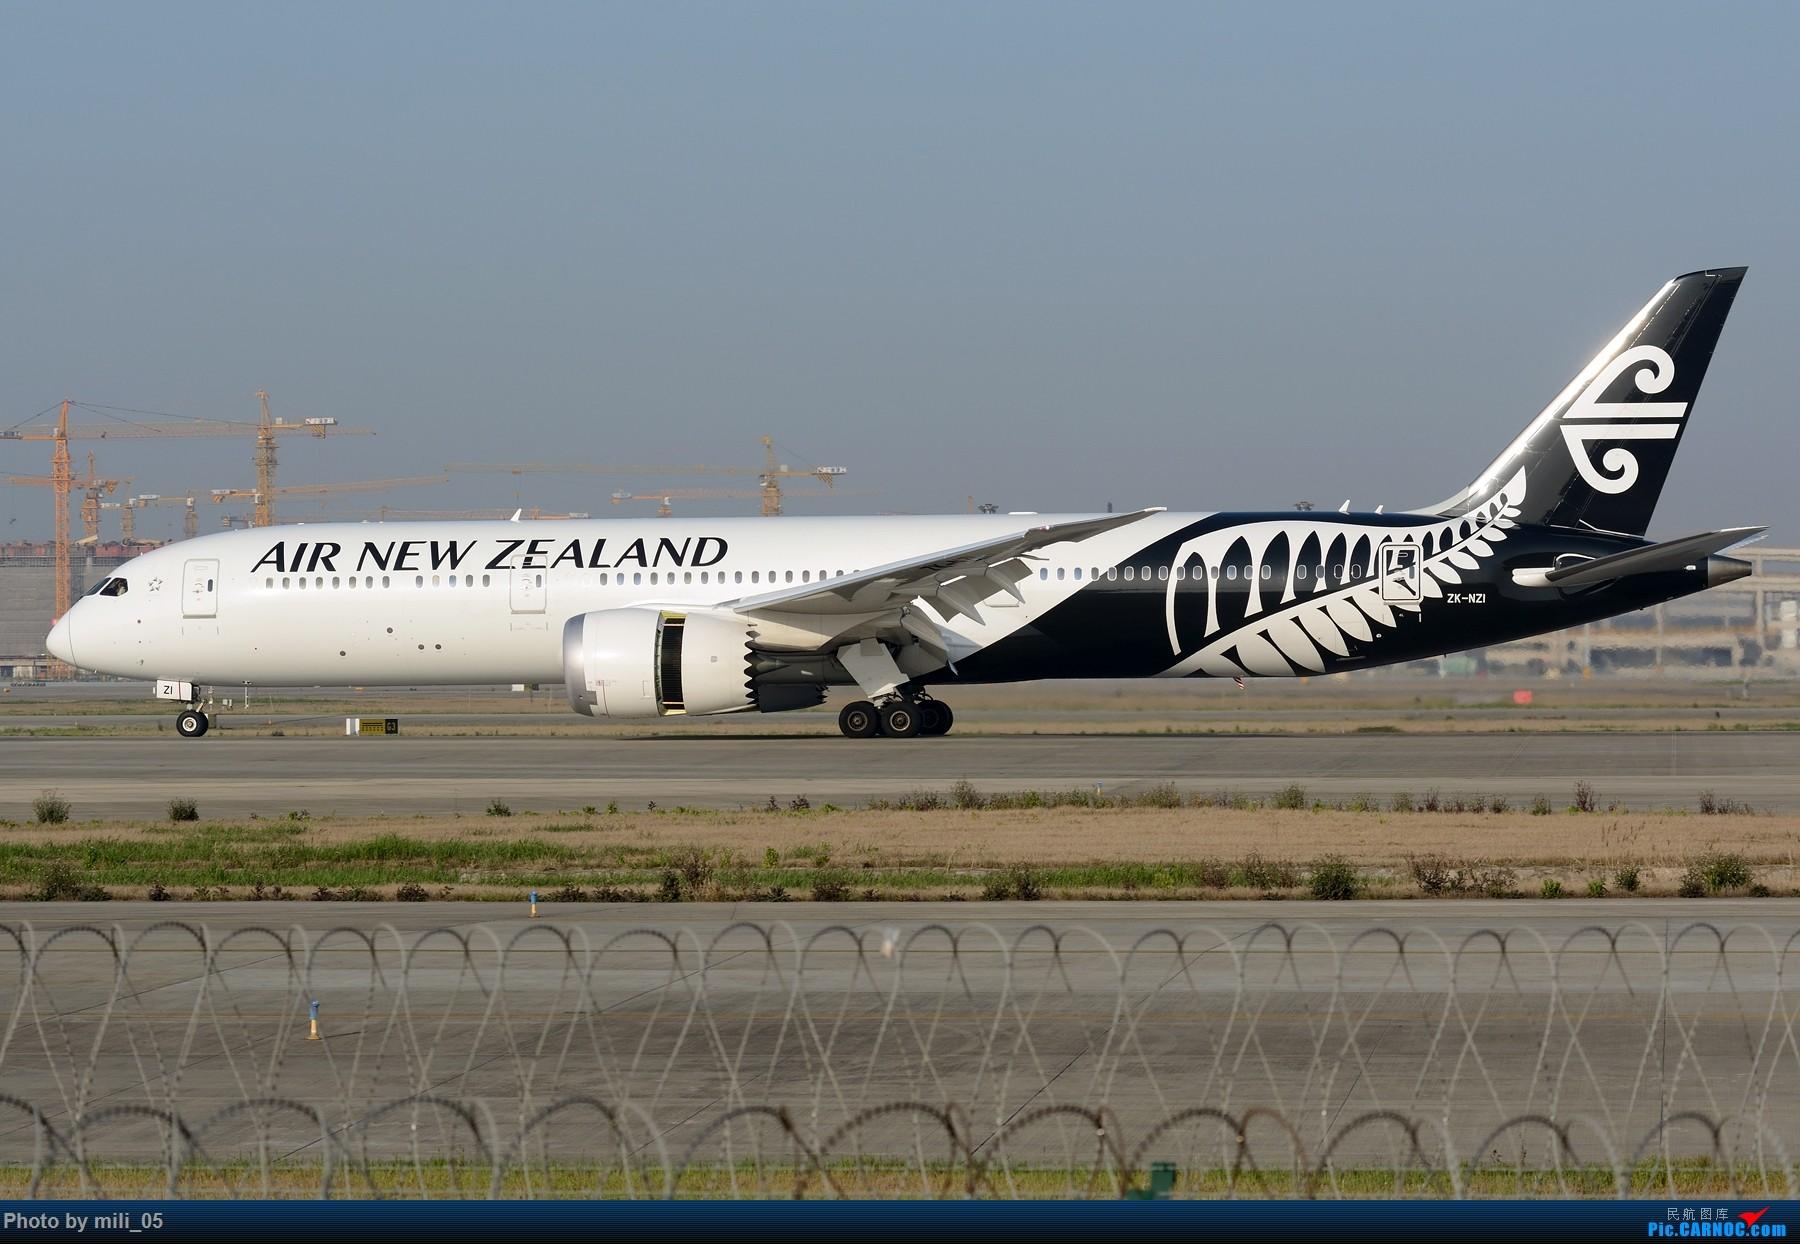 [PVG] 酷炫黑白787-9 BOEING 787-9 ZK-NZI PVG